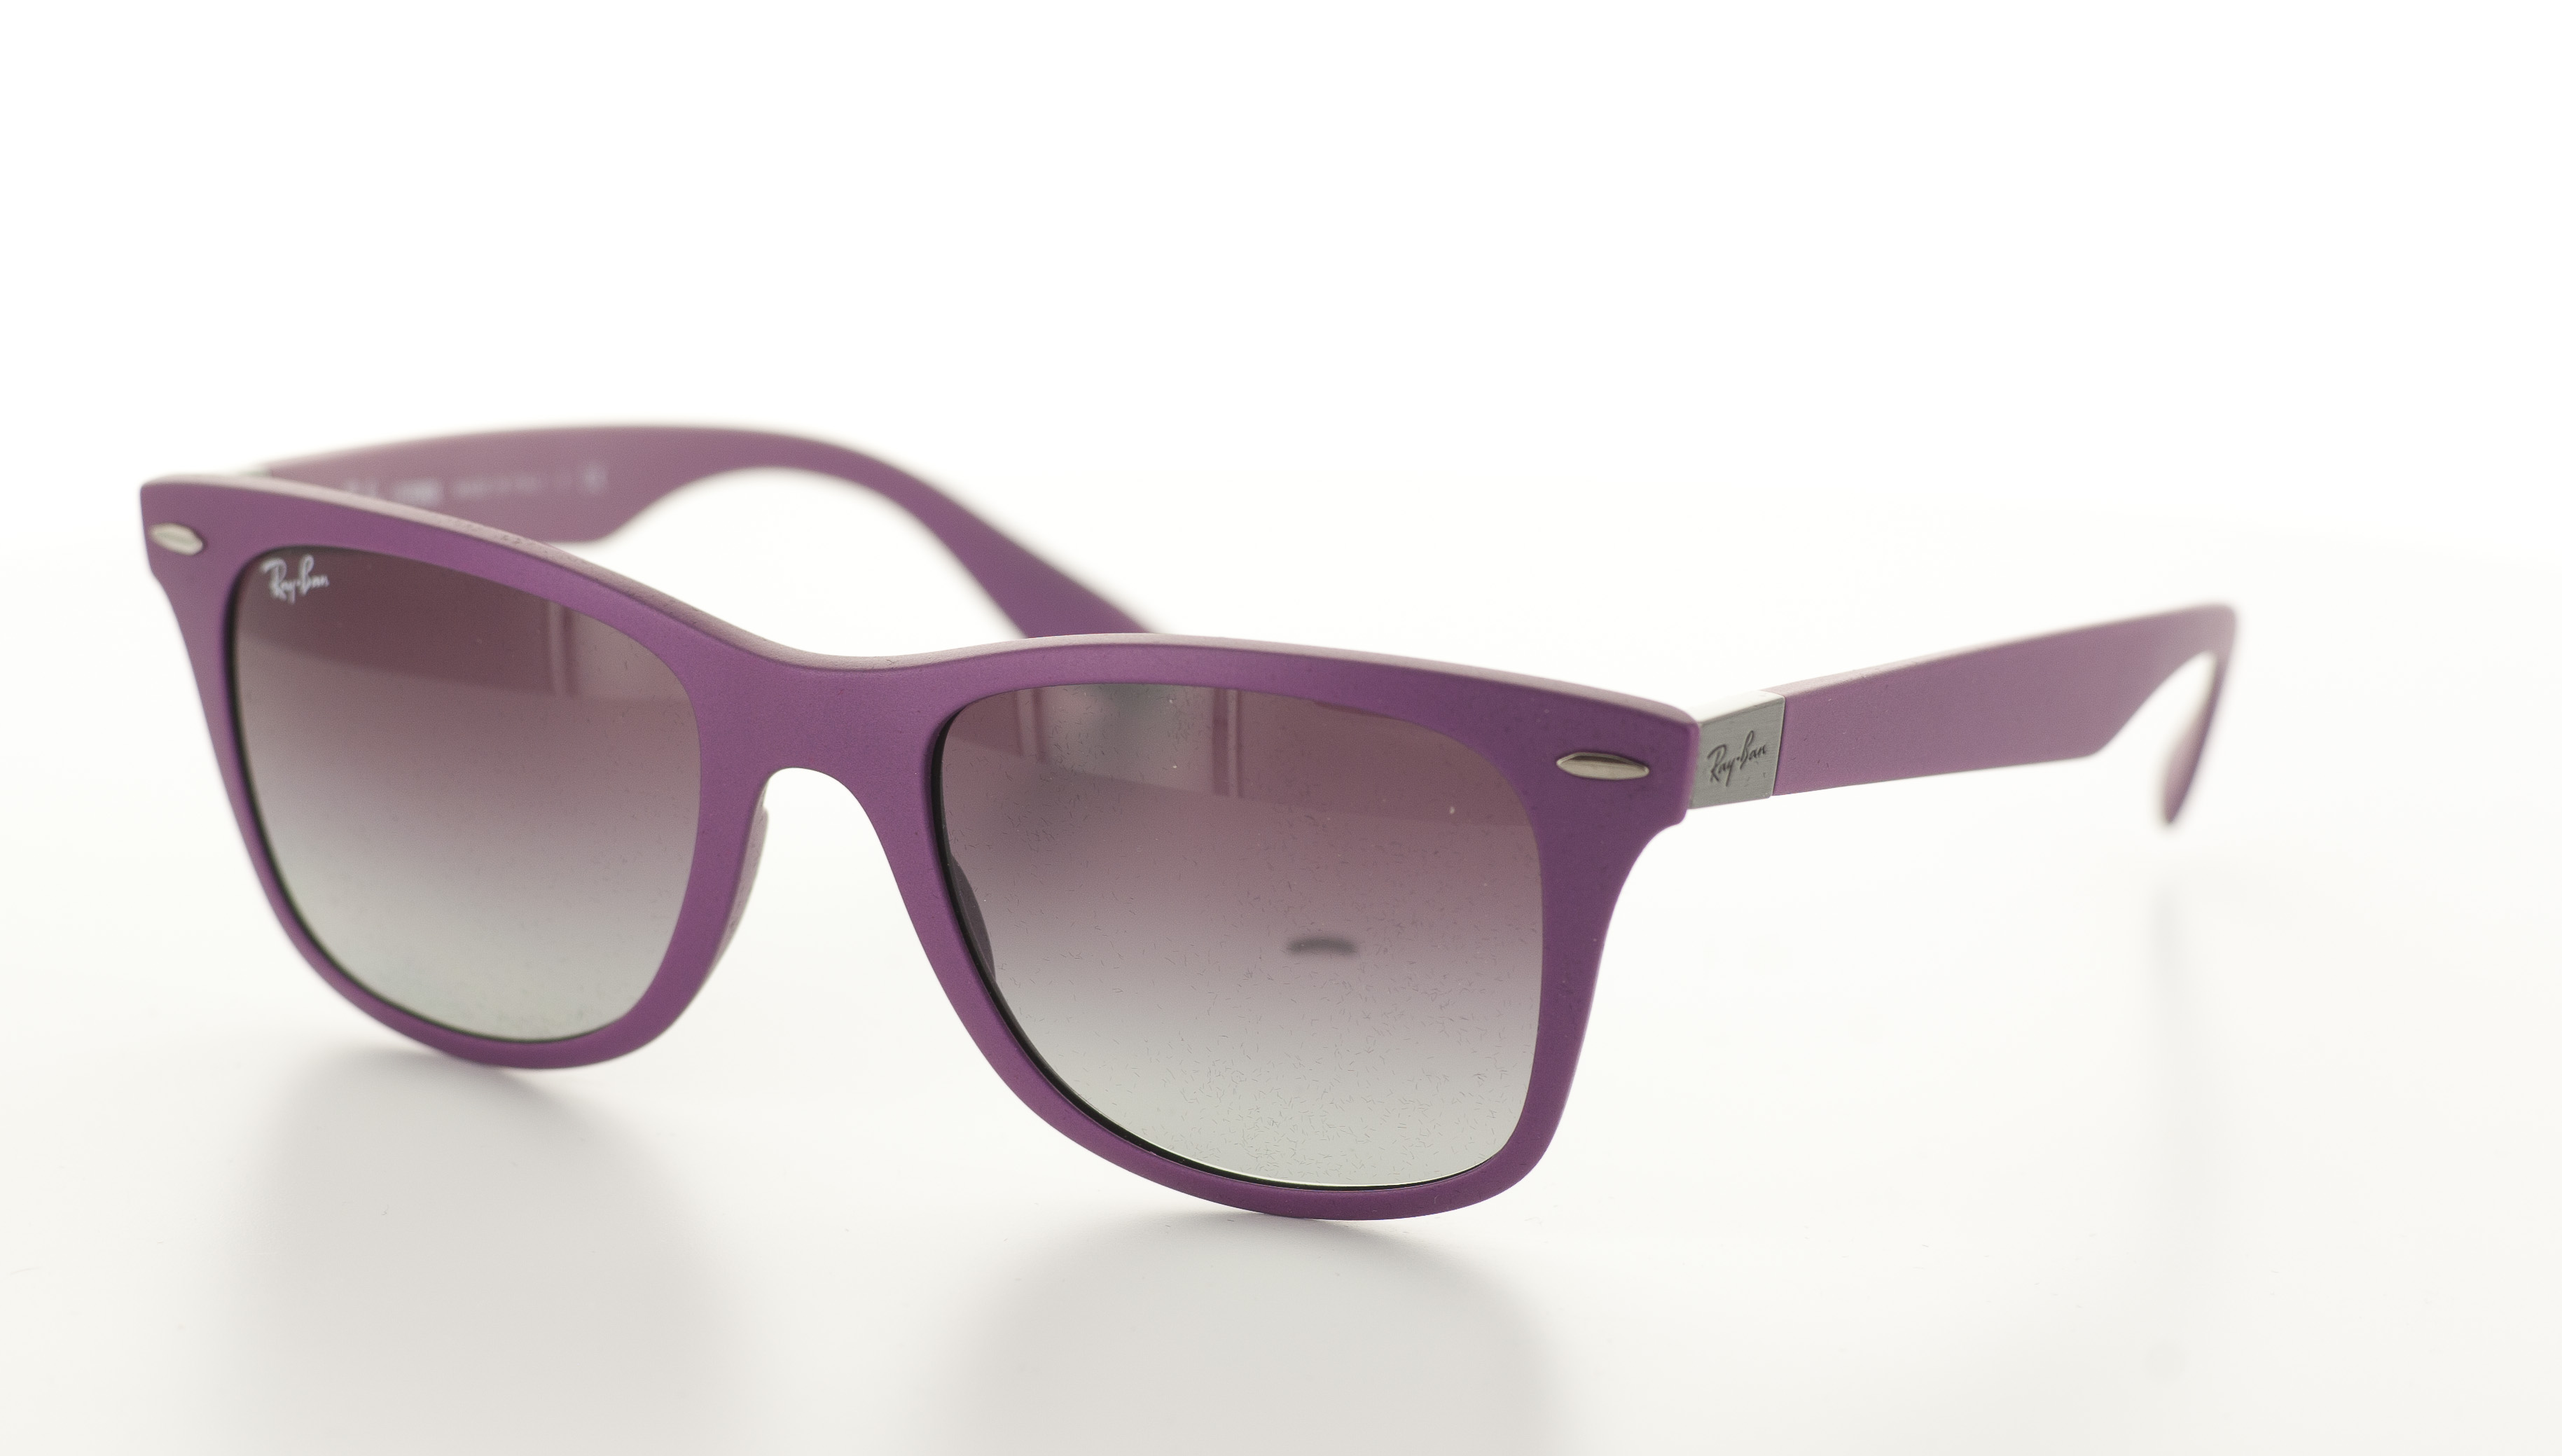 Ray Ban Wayfarer Eyeglasses Frames